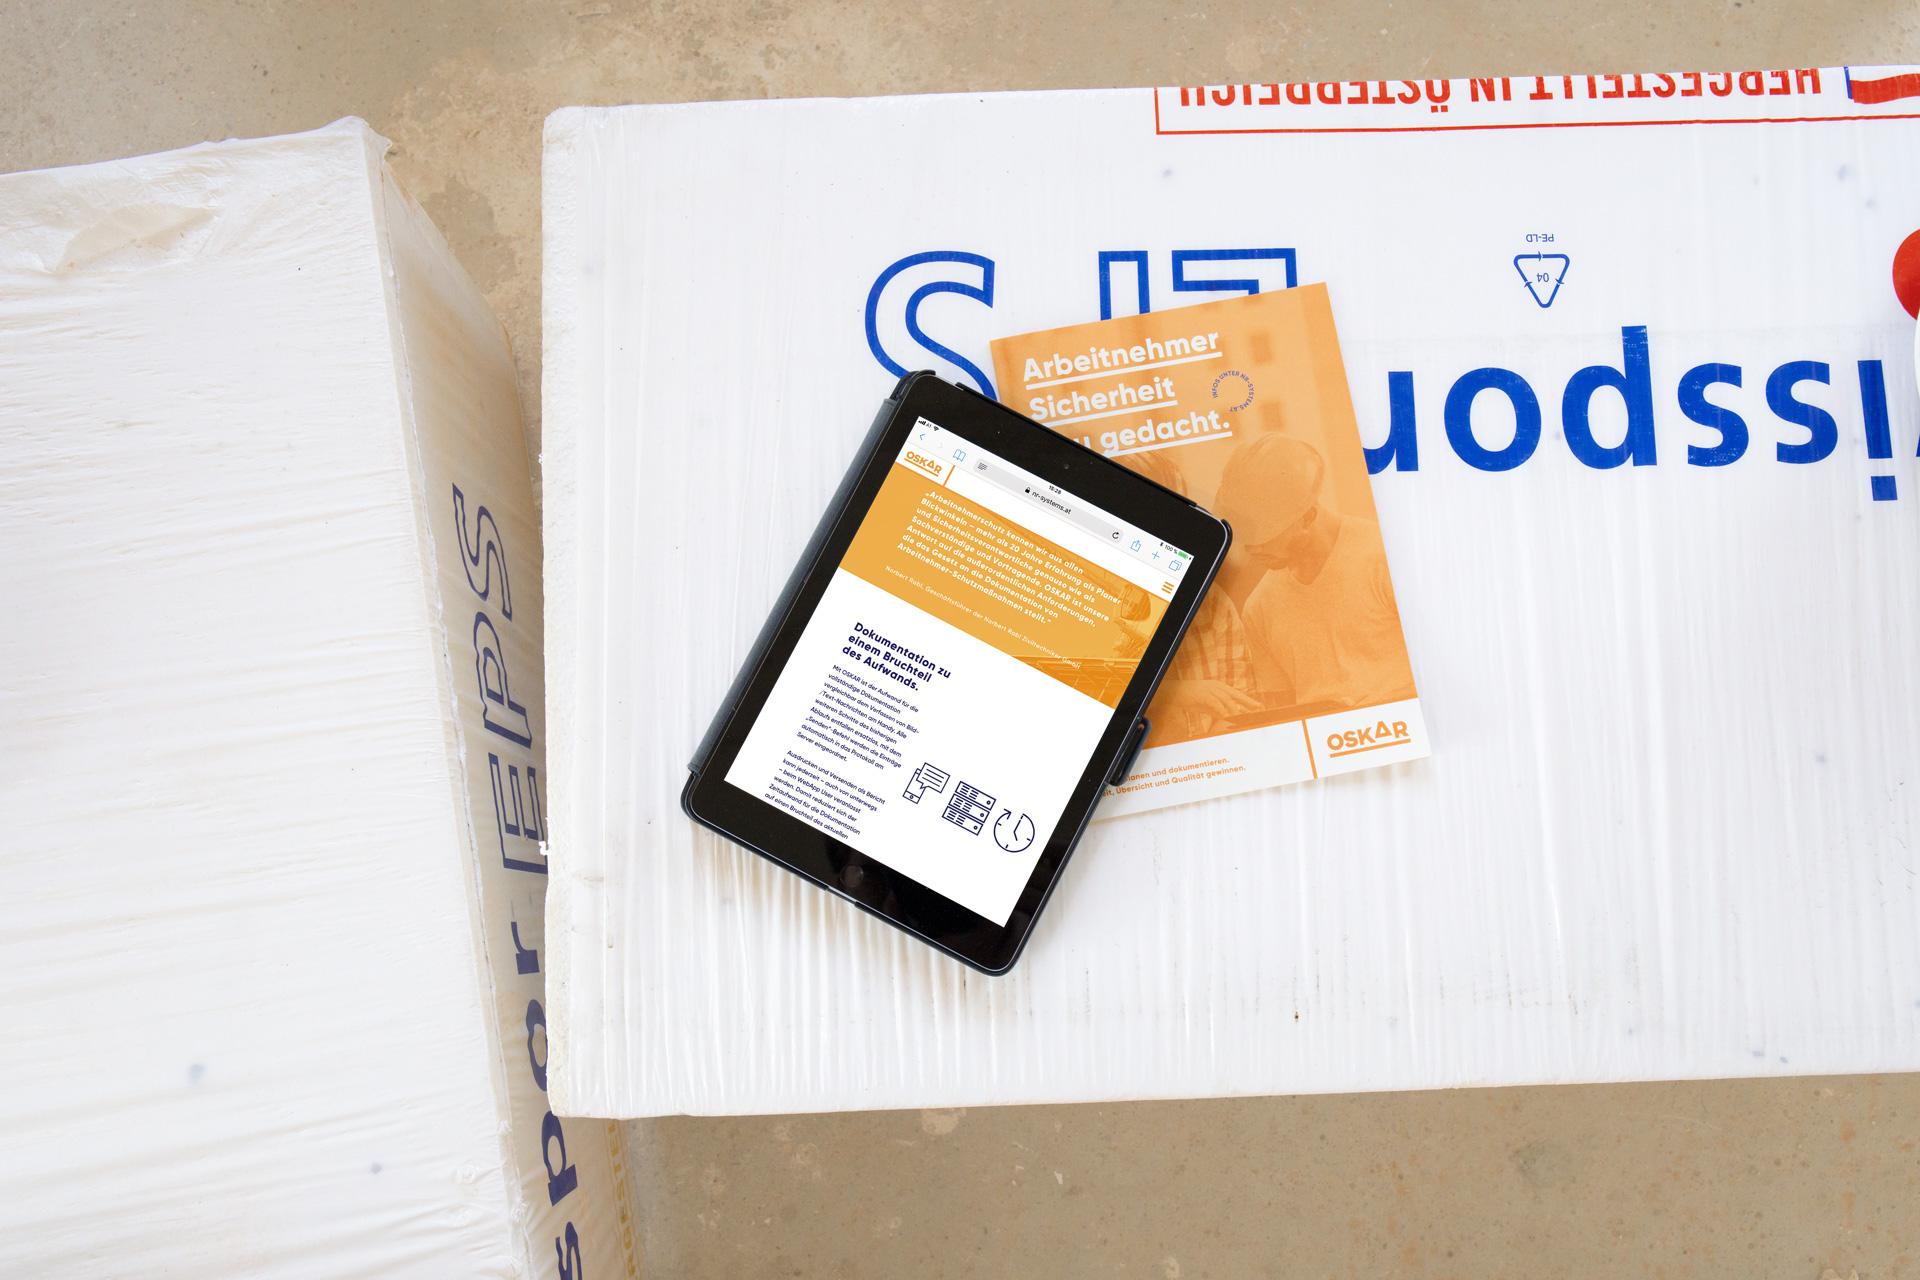 OSK-Baustelle-iPad